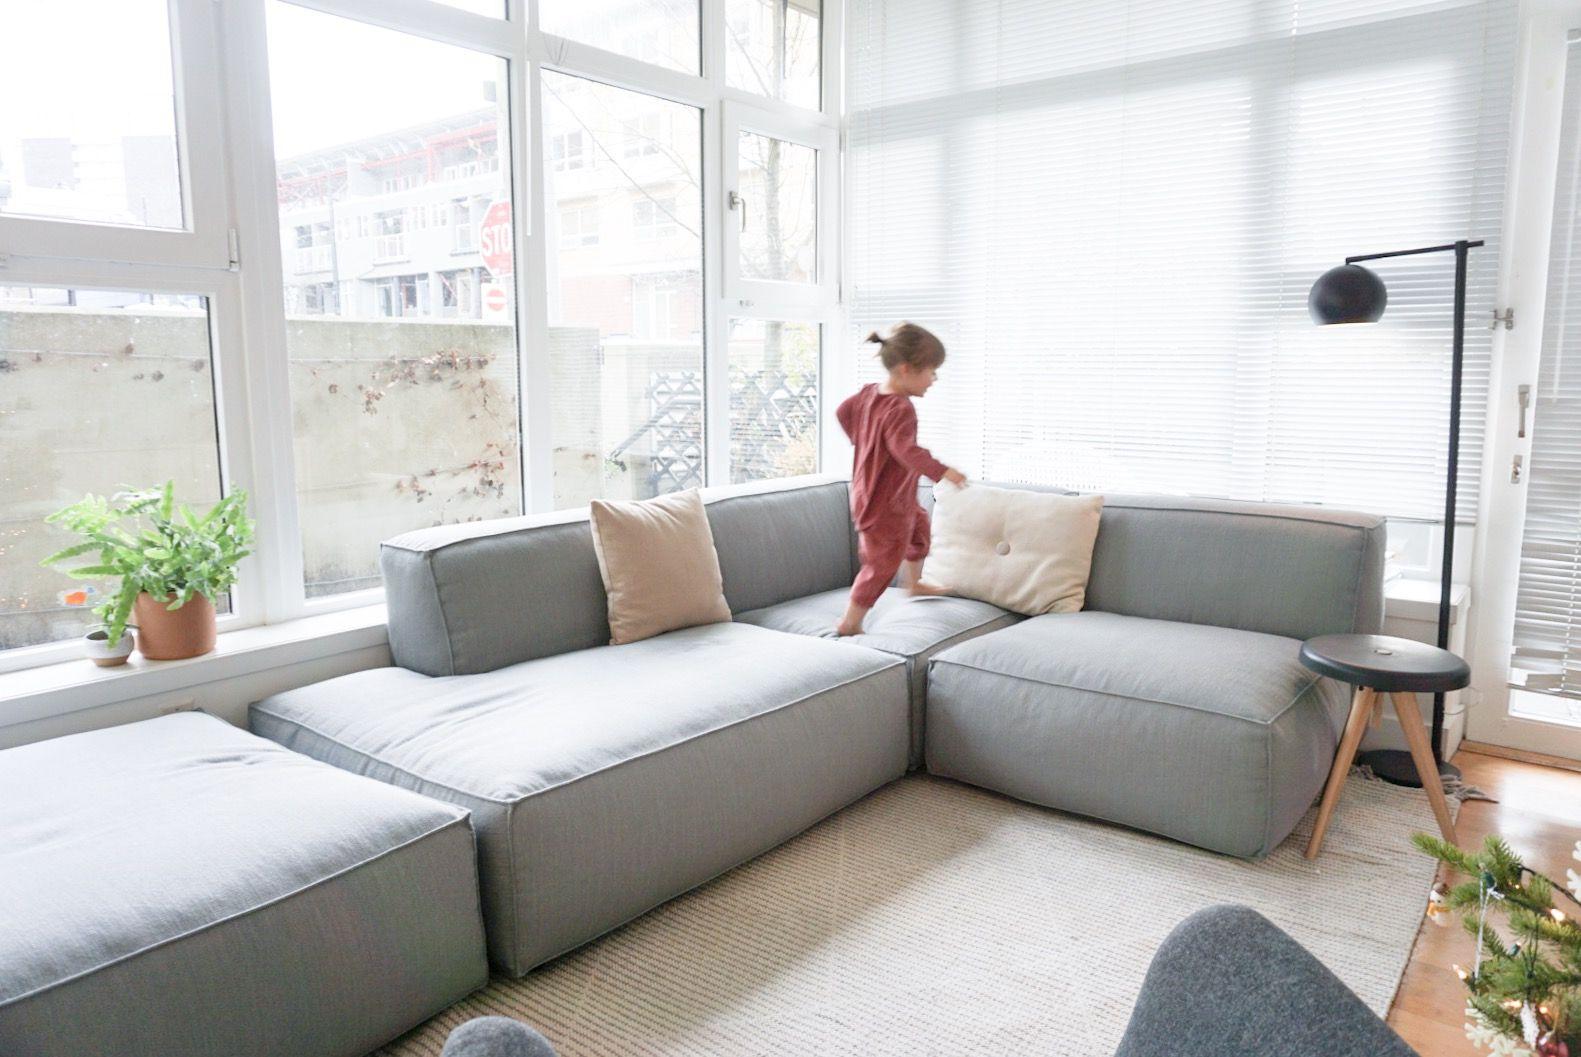 A Modular Sofa For Our Small Space Modular Sofa Sofas For Small